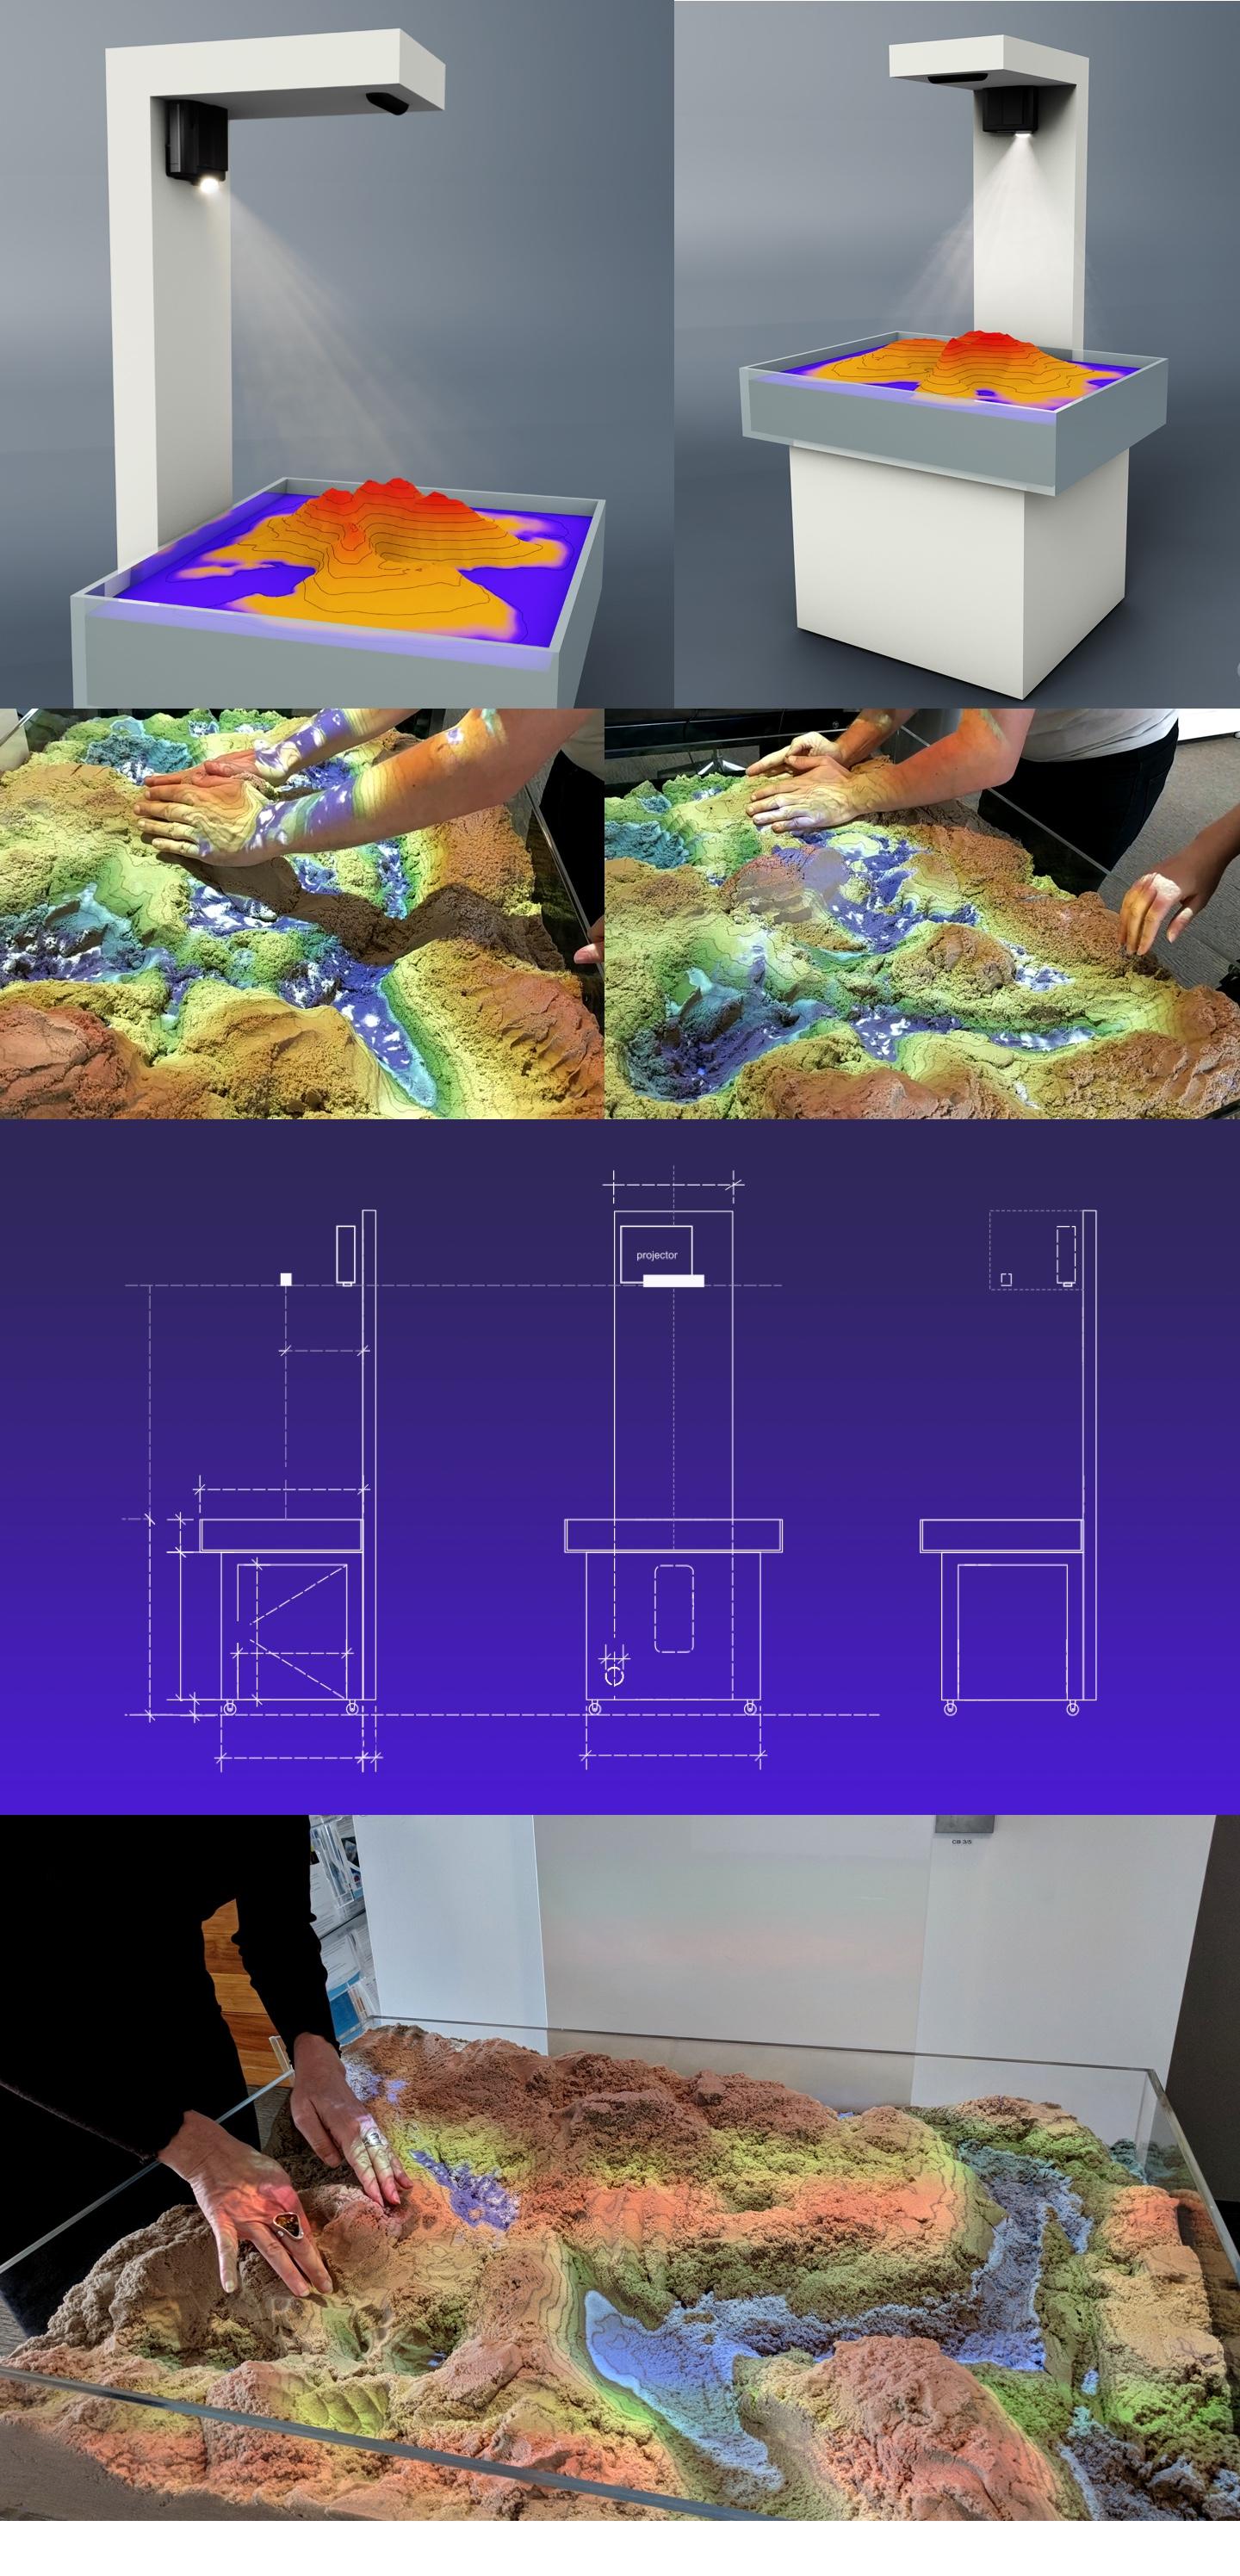 Sydney Water - augmented reality sandbox exhibit